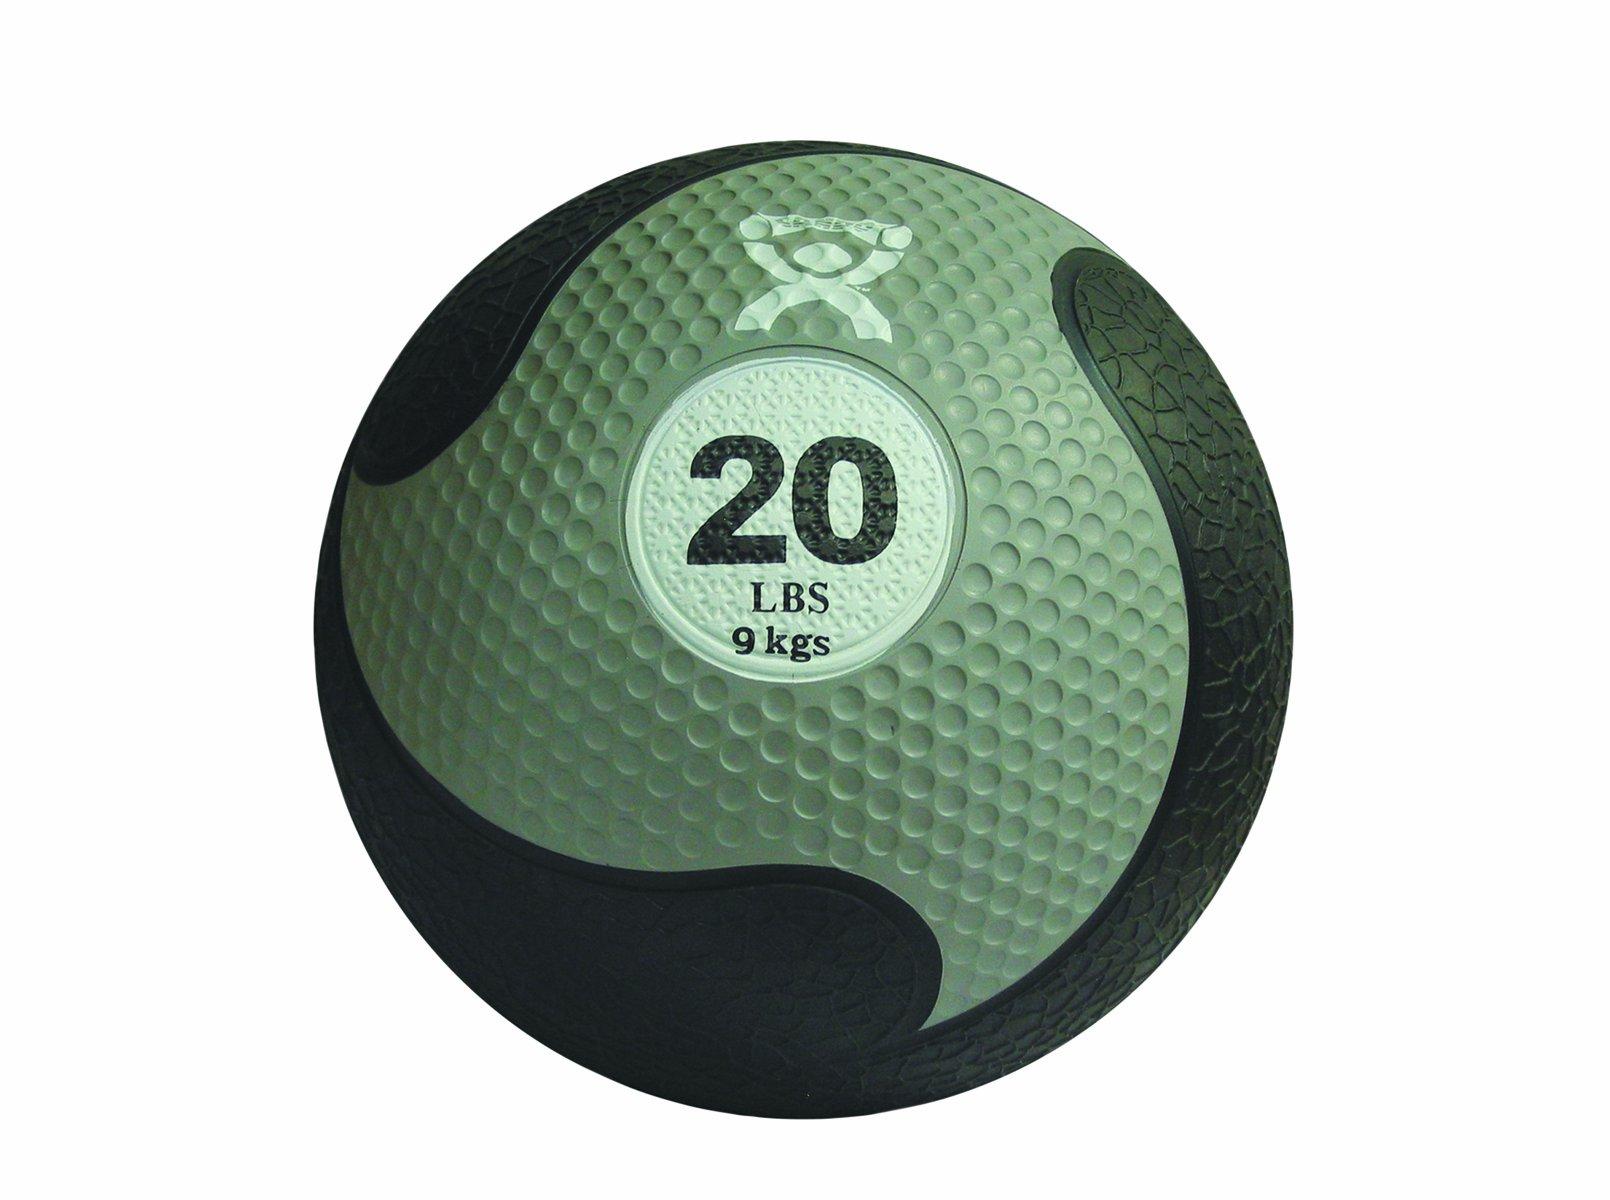 CanDo Rubber Medicine Ball, Silver